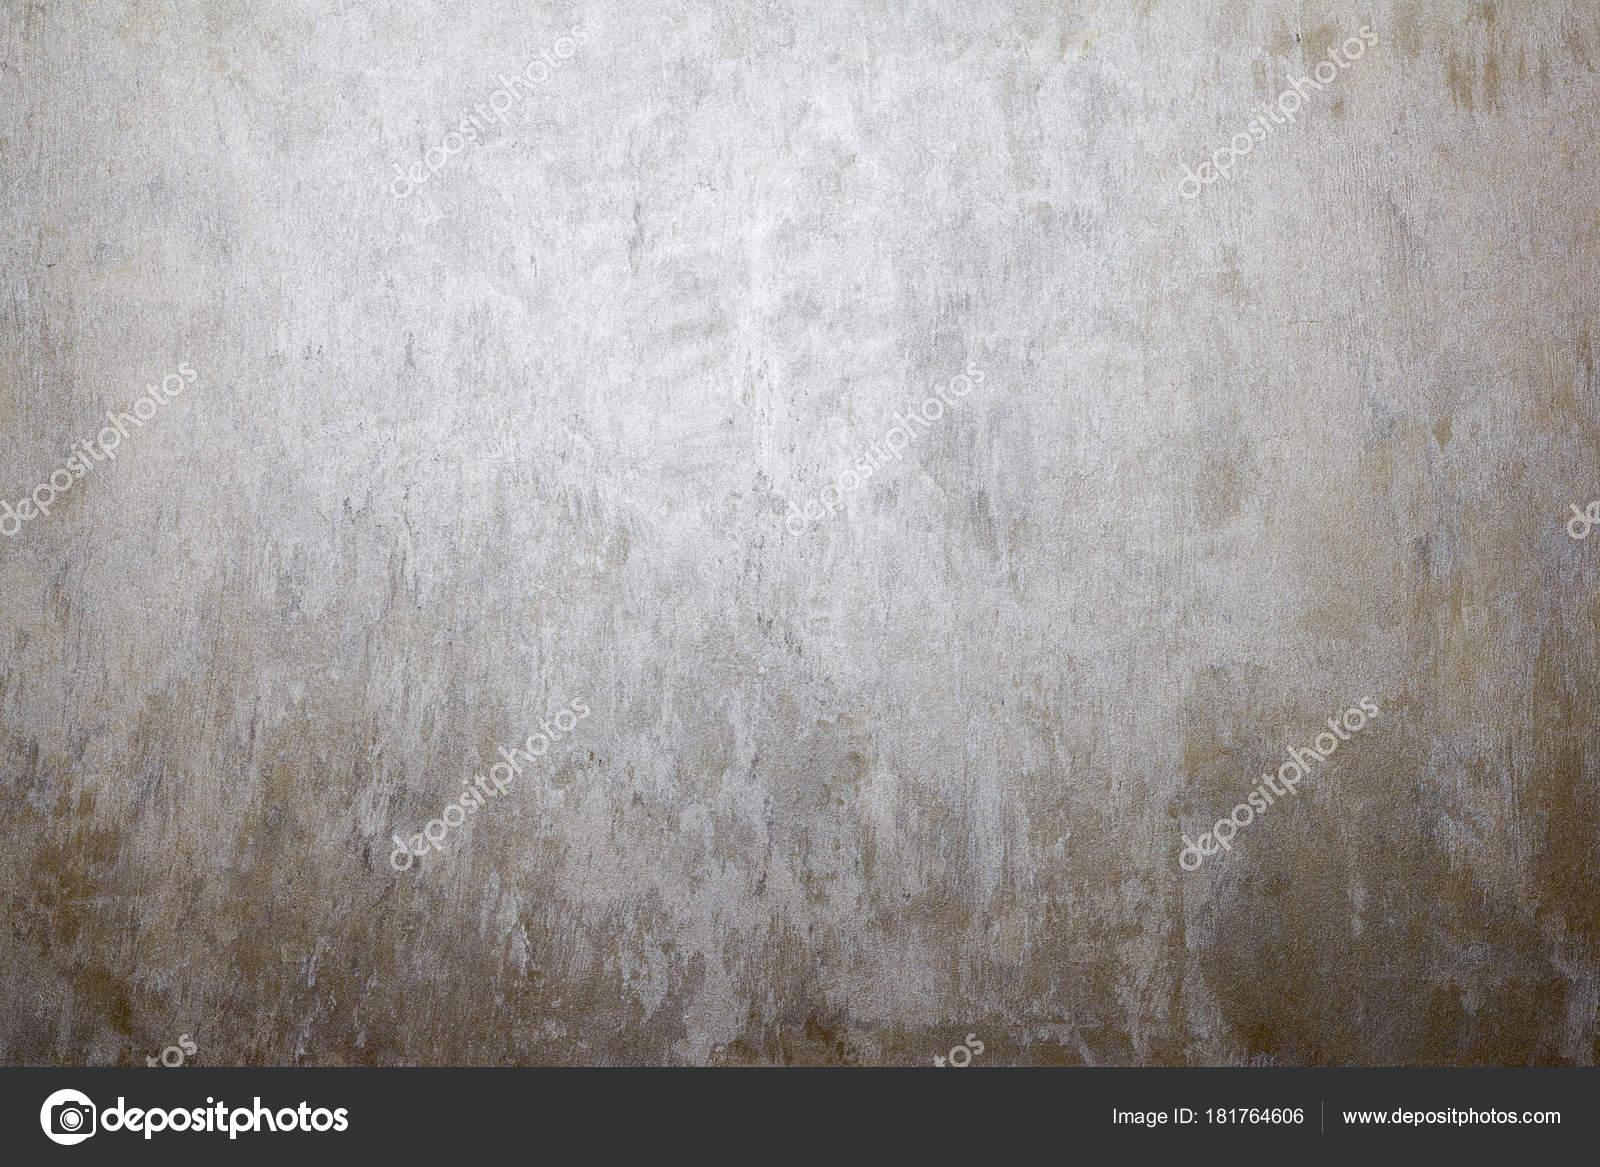 dekorative wandputz — stockfoto © rokvel #181764606